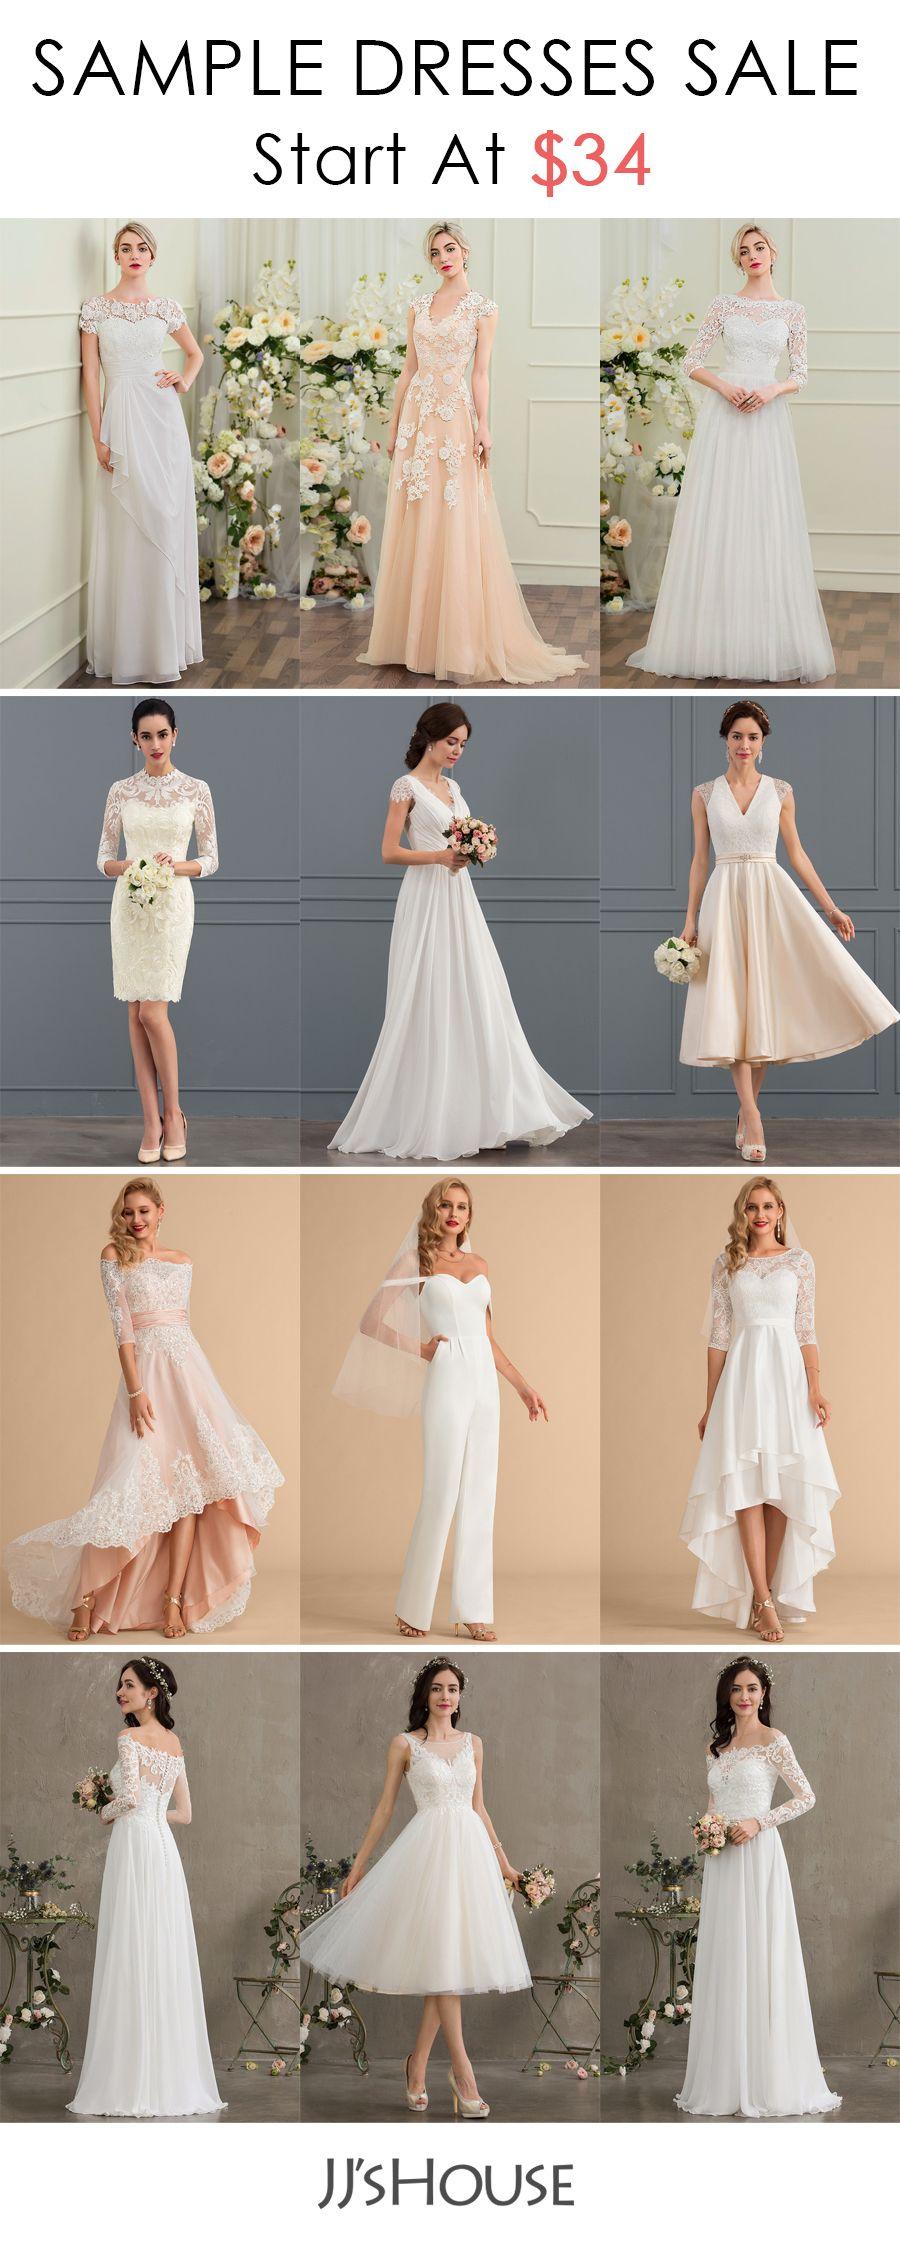 Sale Wedding Dresses Bridal Dresses 2020 Jj Shouse In 2020 Wedding Dress Sample Sale Wedding Dresses For Sale Online Wedding Dress